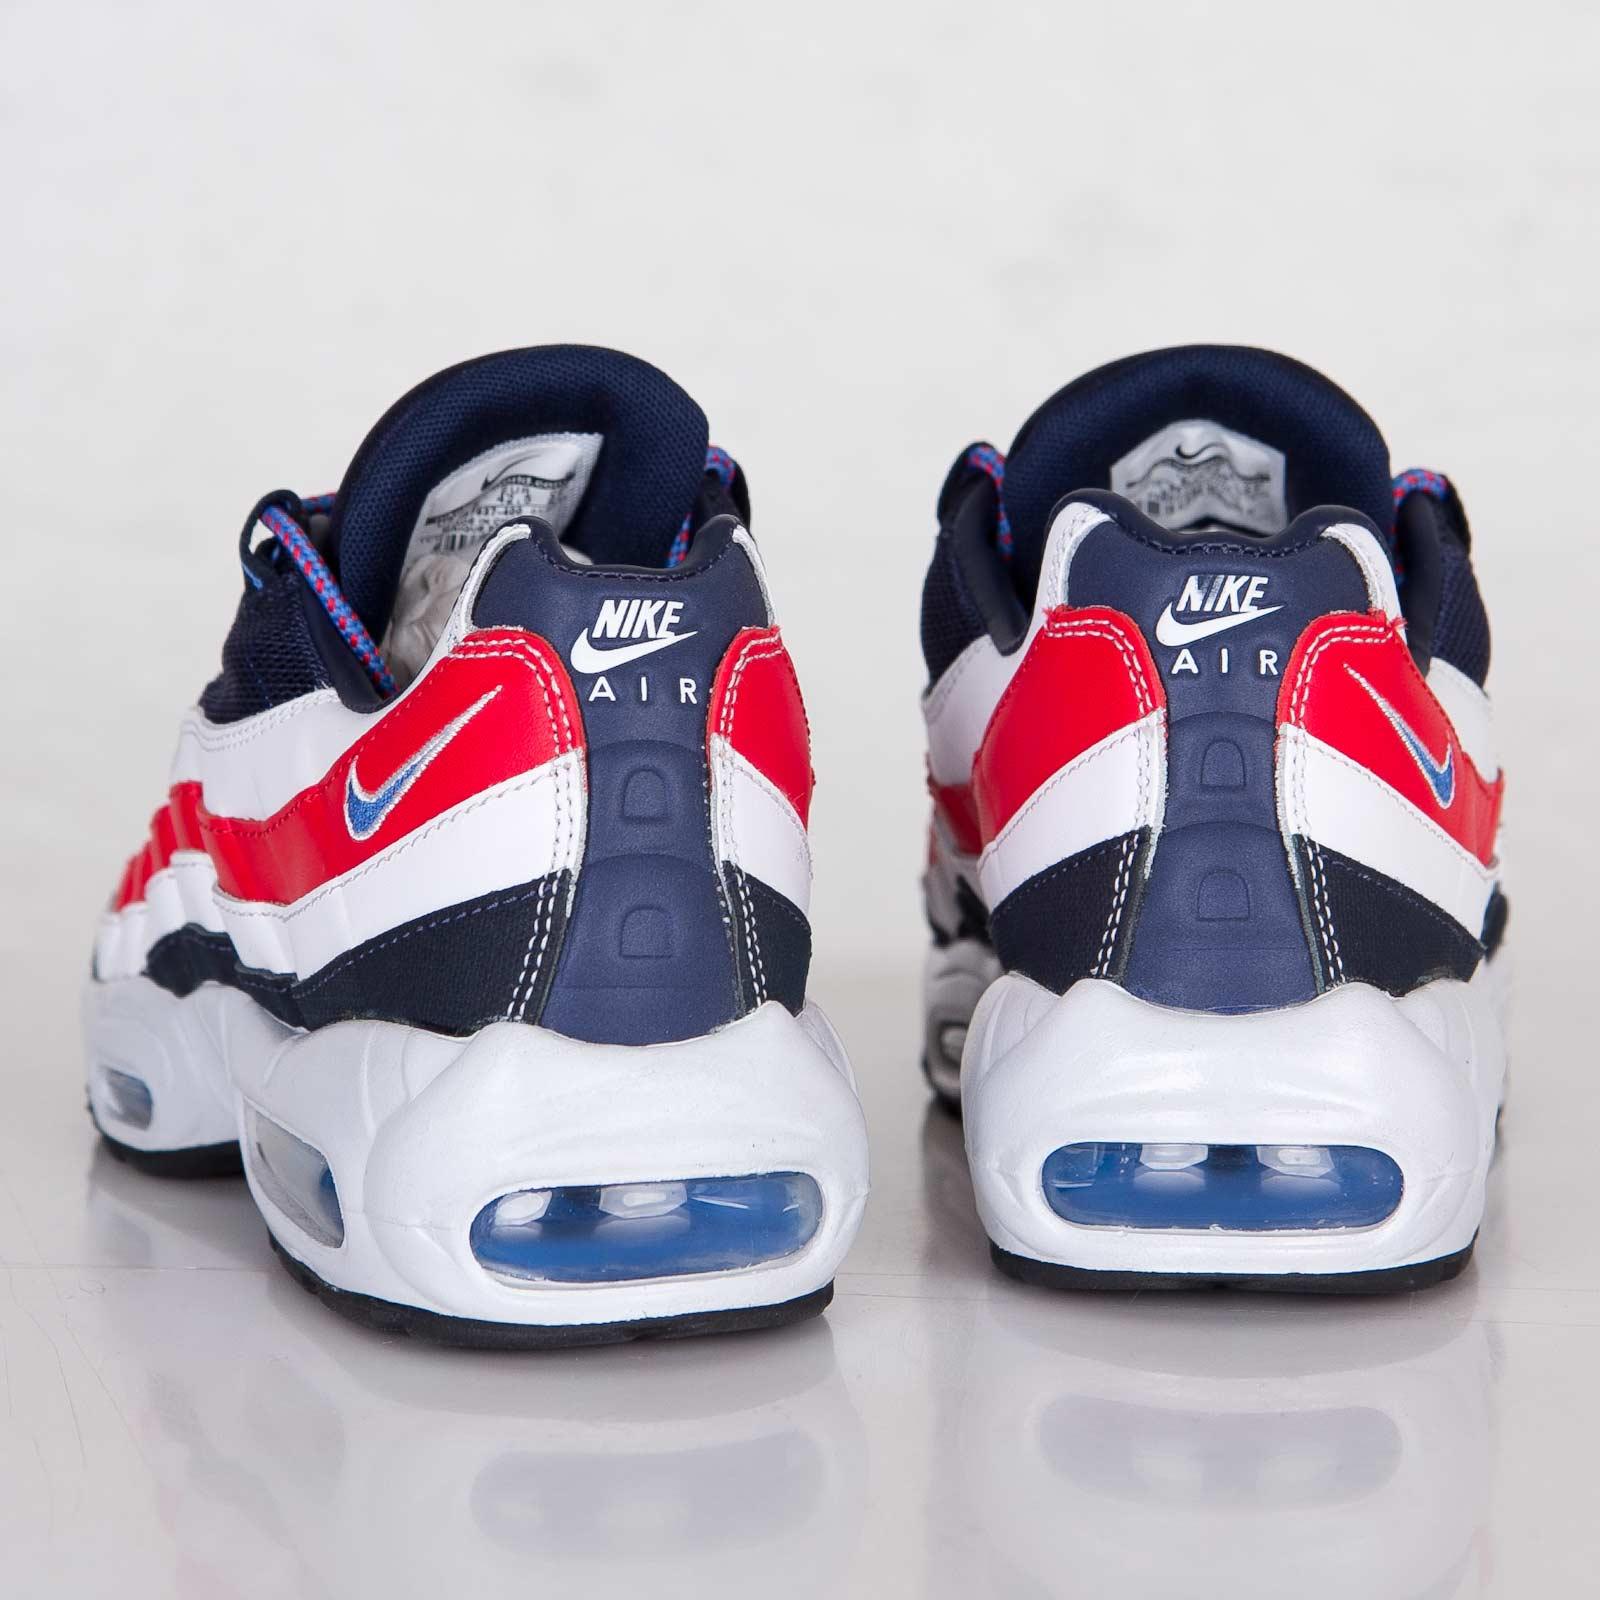 Consciente de aprobar Hong Kong  Nike Air Max 95 City QS - 667637-400 - Sneakersnstuff | sneakers &  streetwear online since 1999